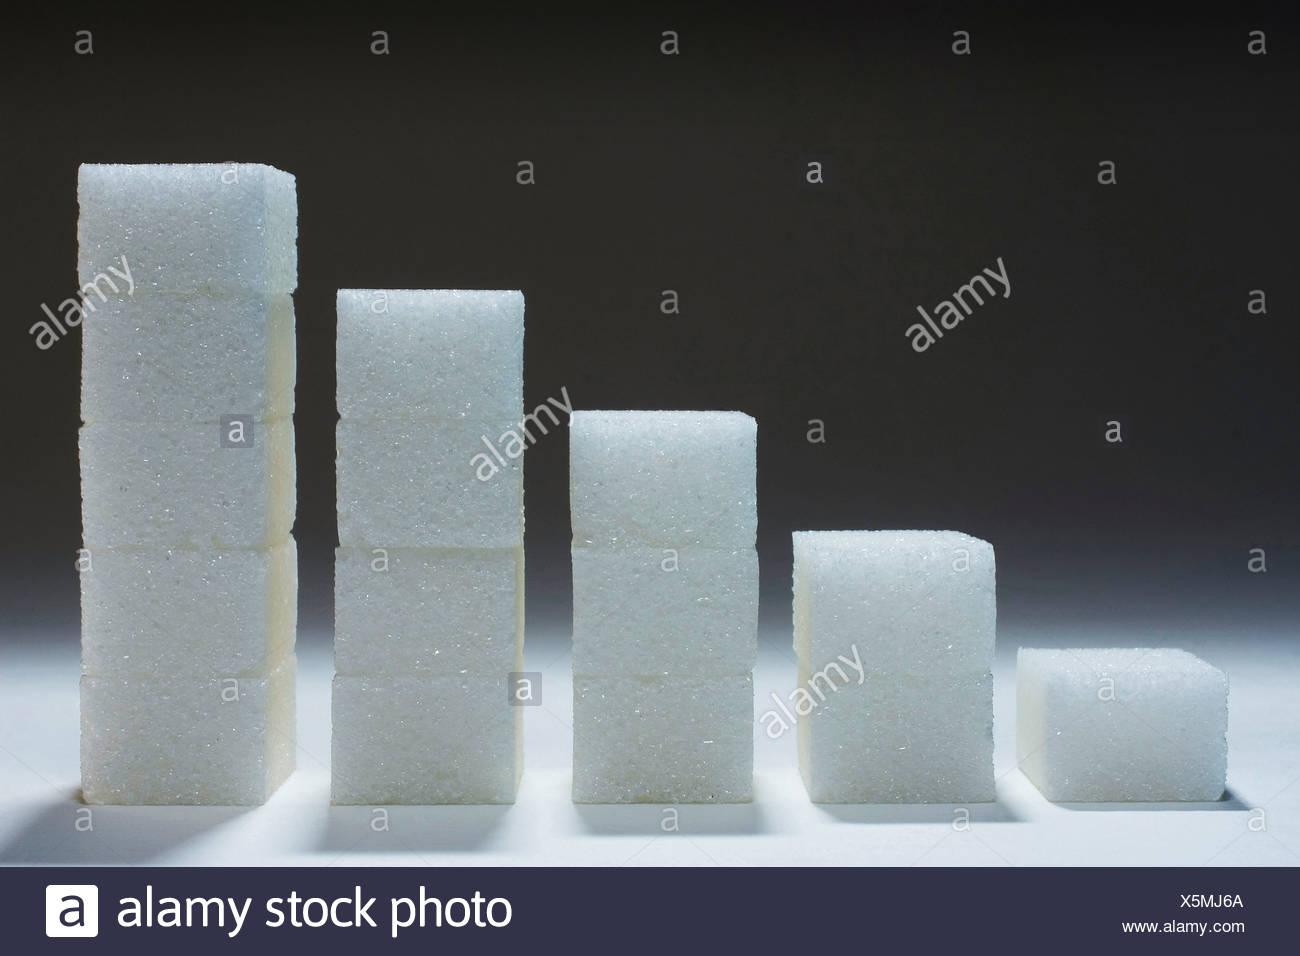 Sugars - Stock Image